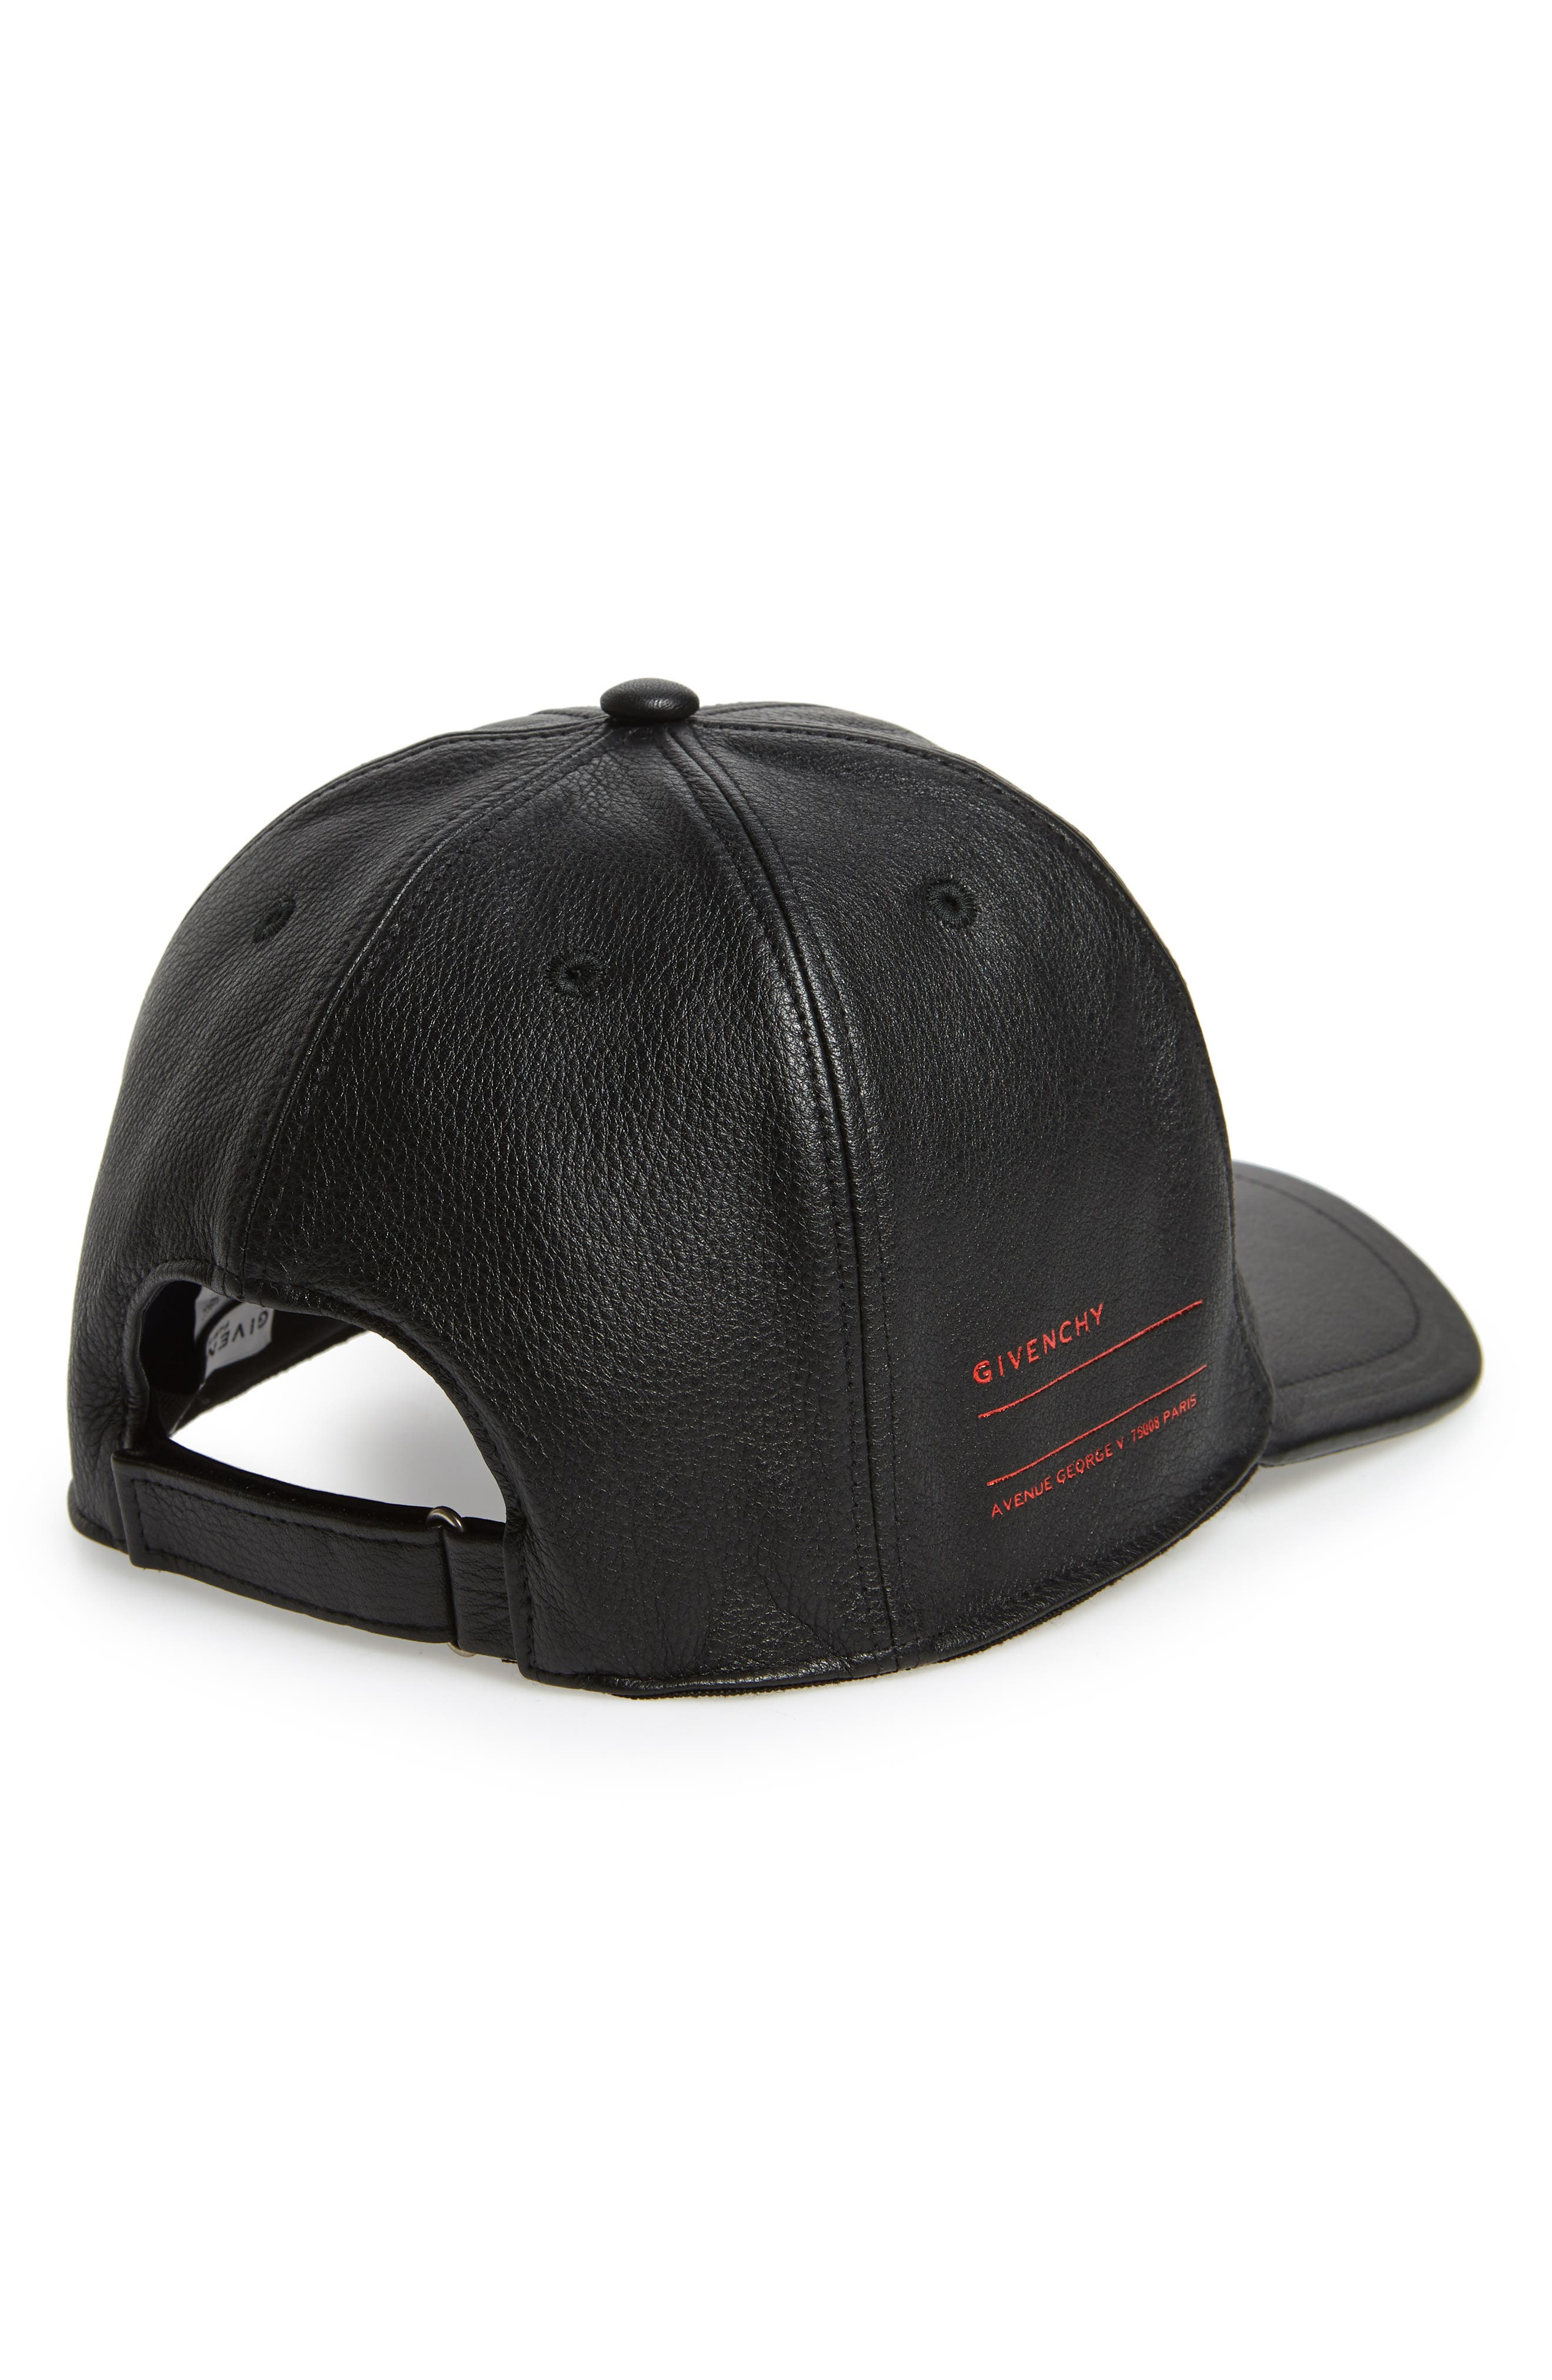 Leather Ball Cap,                             Alternate thumbnail 2, color,                             Black/ White